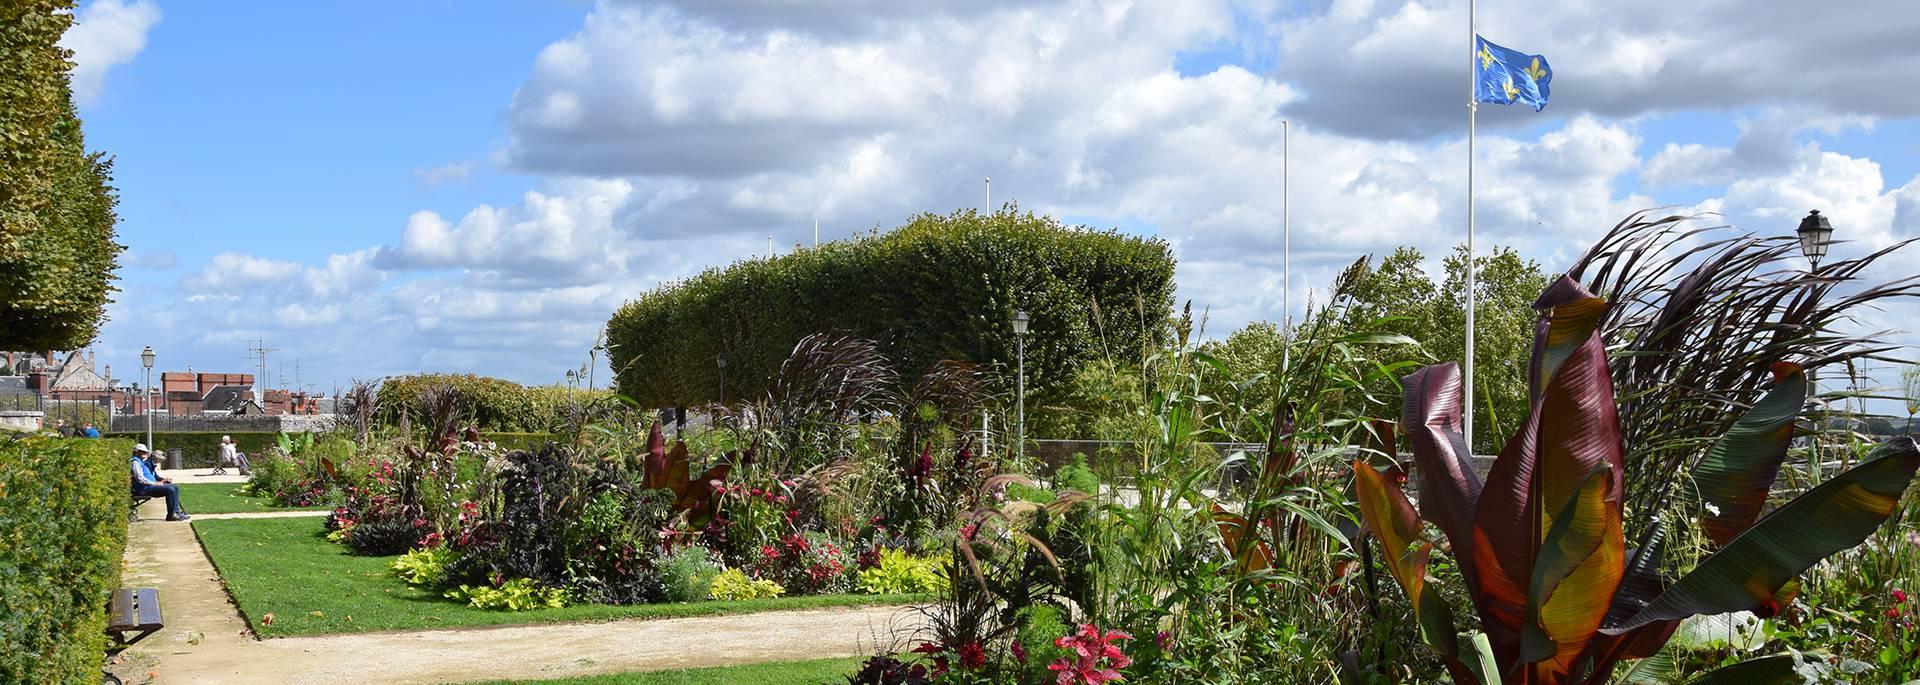 Giardini Saint-Sauveur in estate a Blois